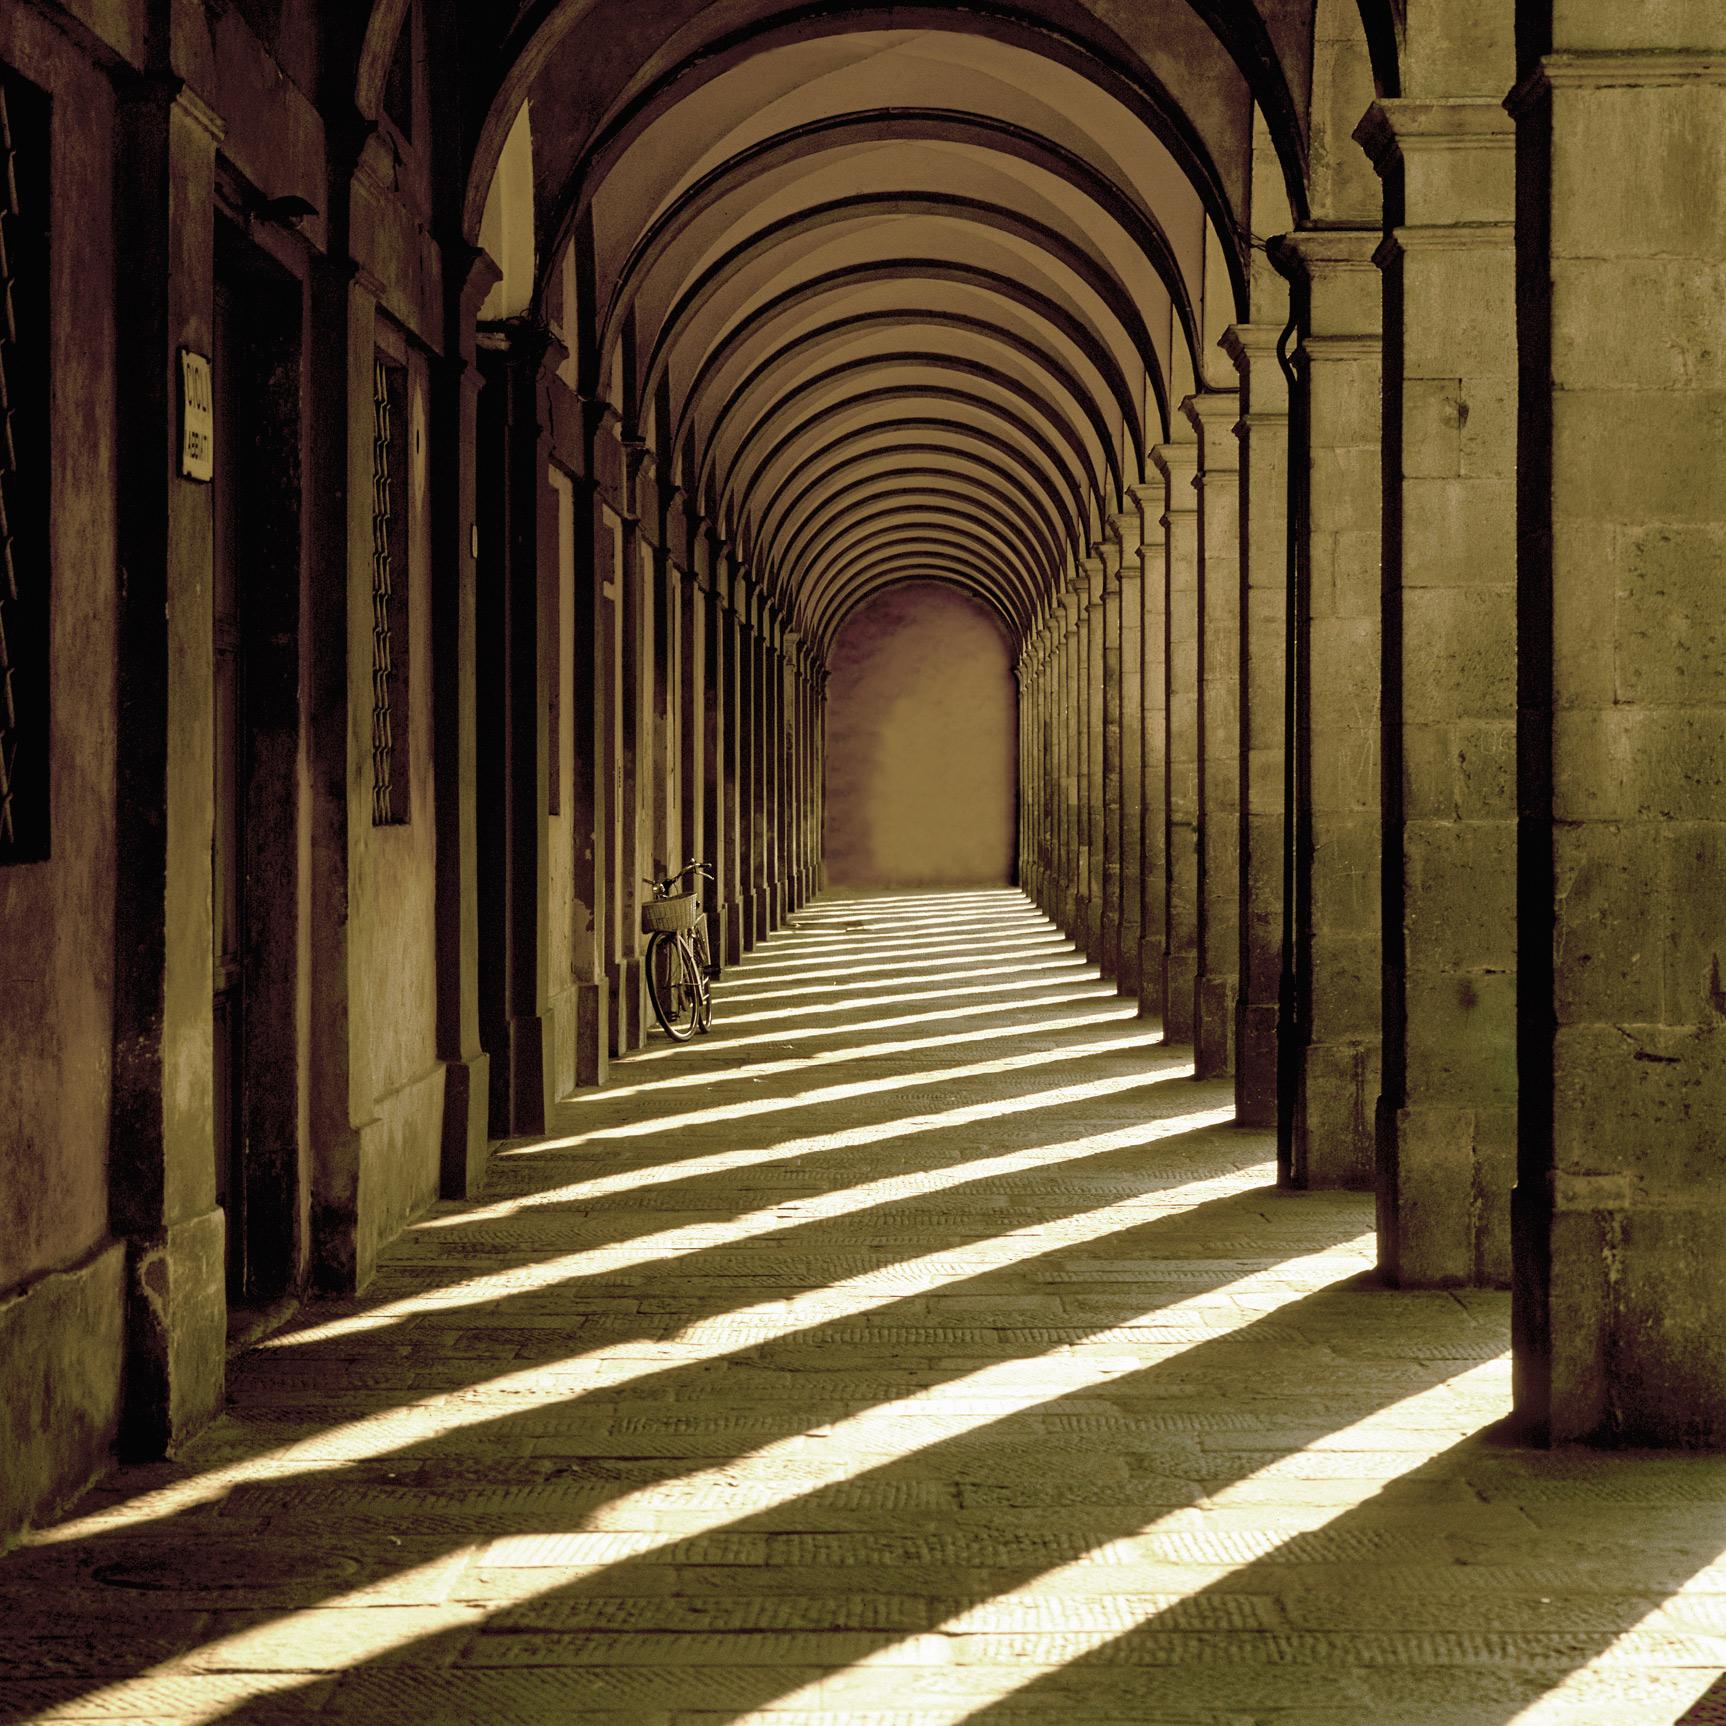 Lucca, Tuscany, Italy (030010)